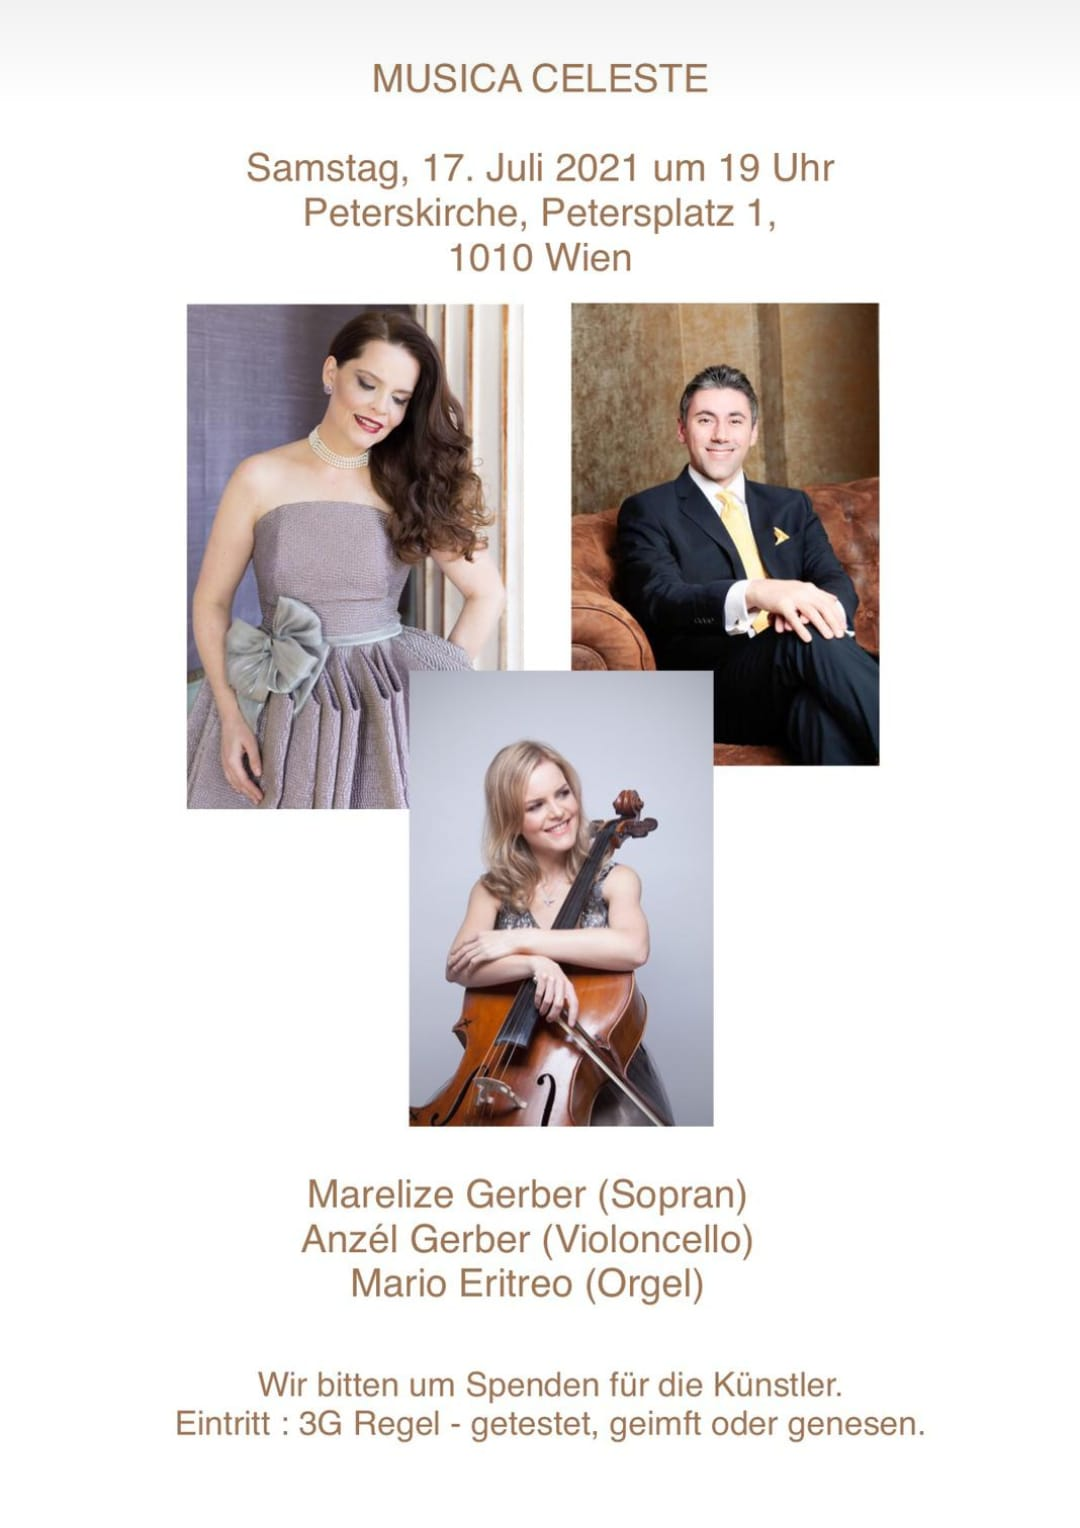 Anzel Gerber - Musica Celeste